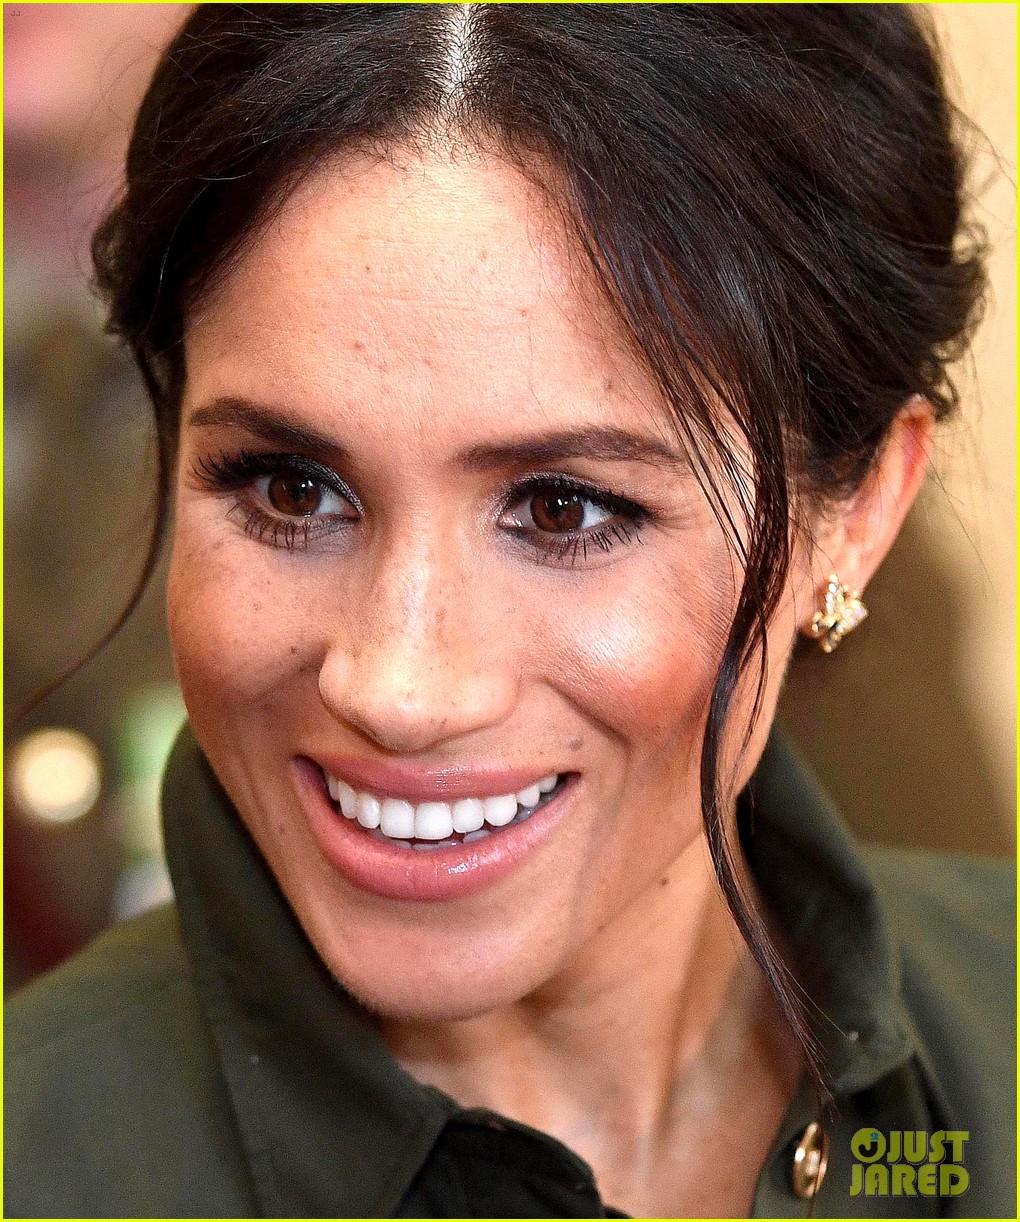 Duchess Meghan Markle Looks Stunning In Second Maternity